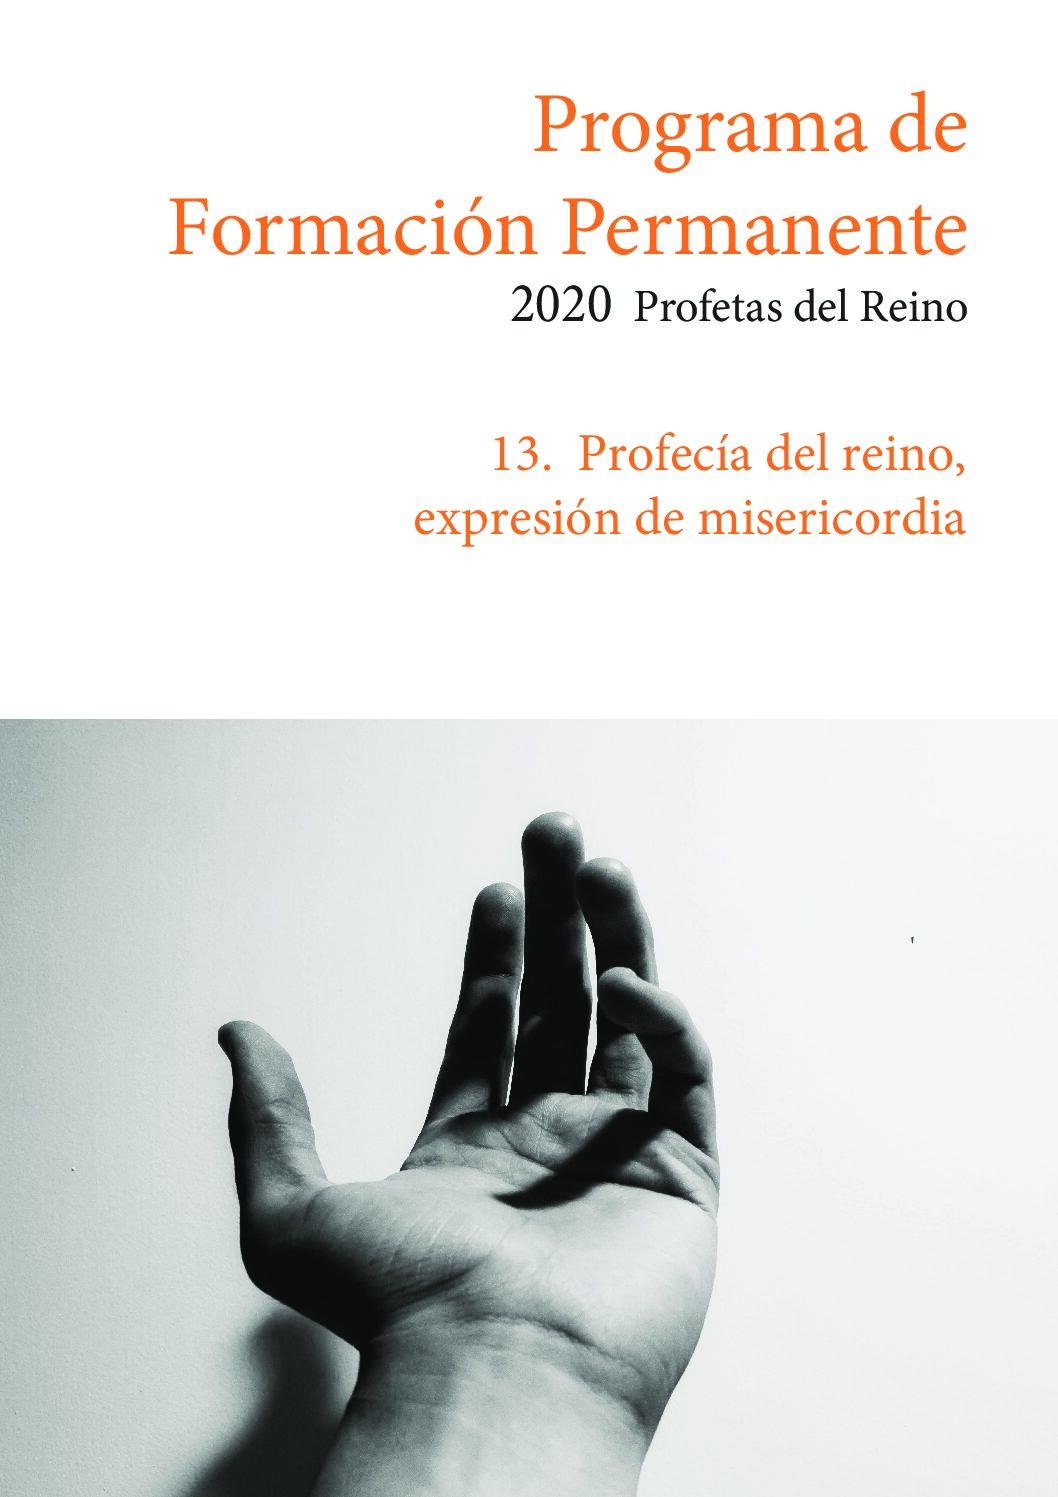 13.-Profecia-del-reino-pdf1.jpg